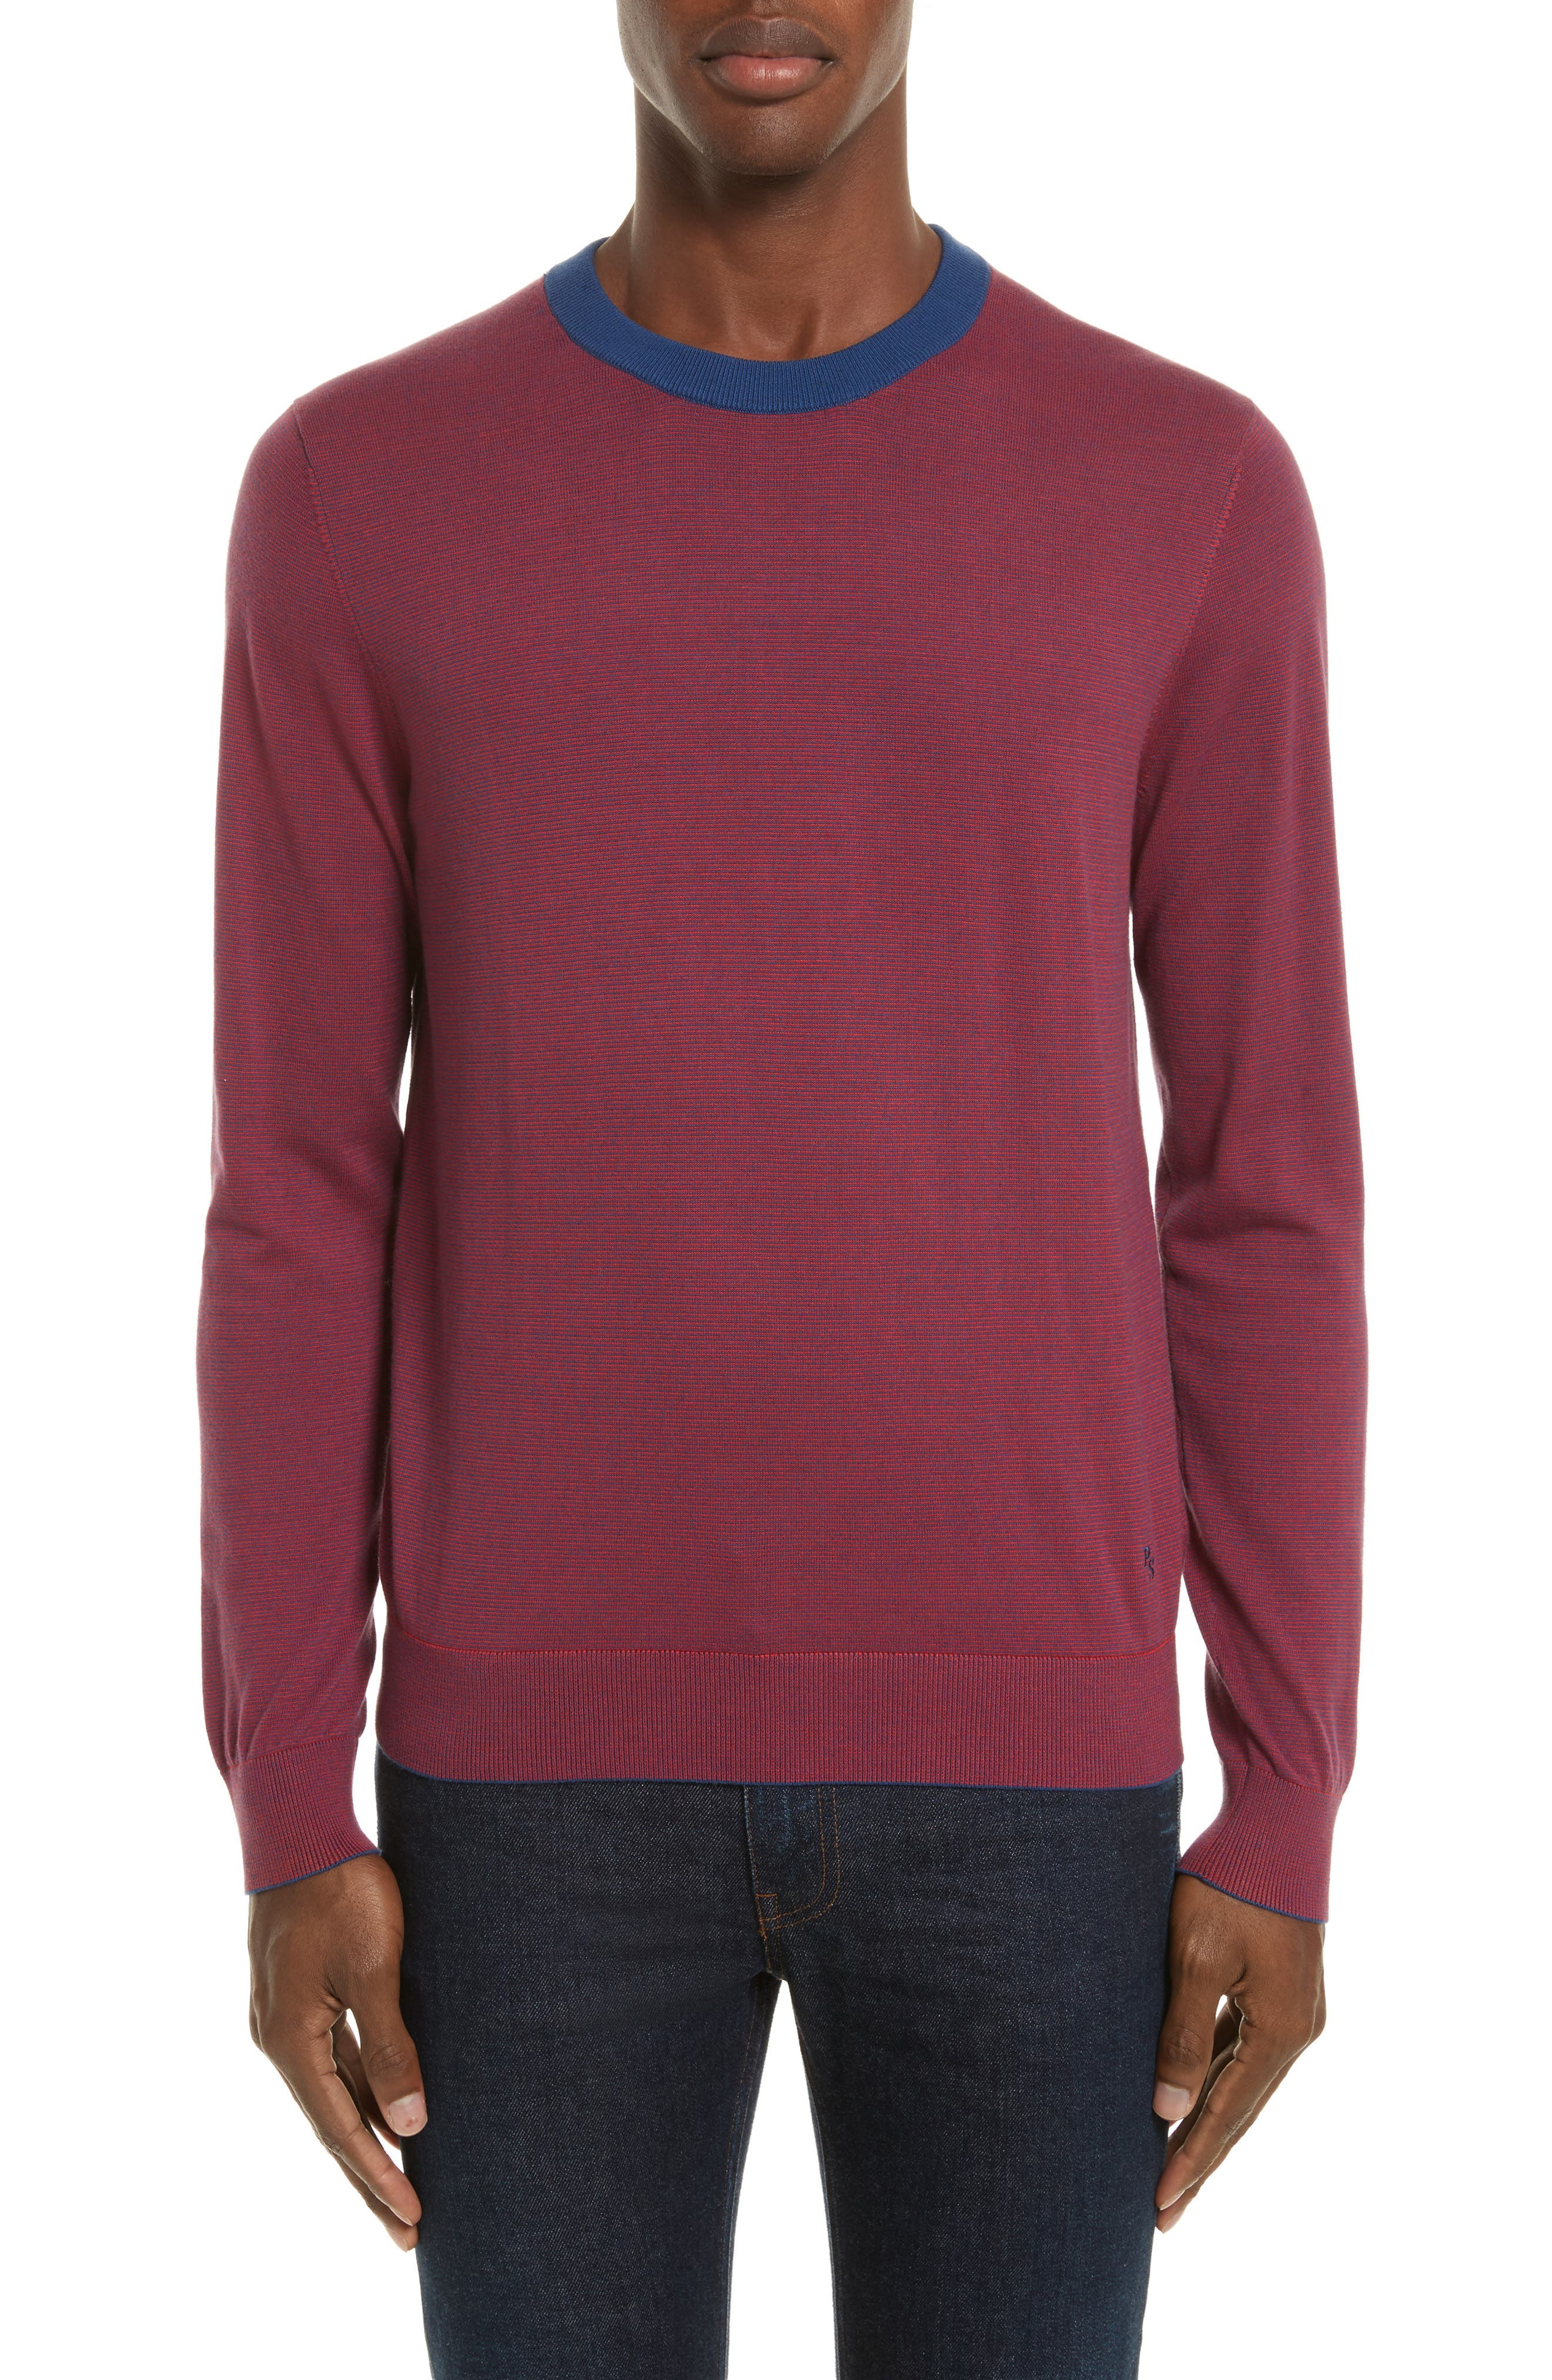 Ministripe Crewneck Sweater,                             Main thumbnail 1, color,                             Red